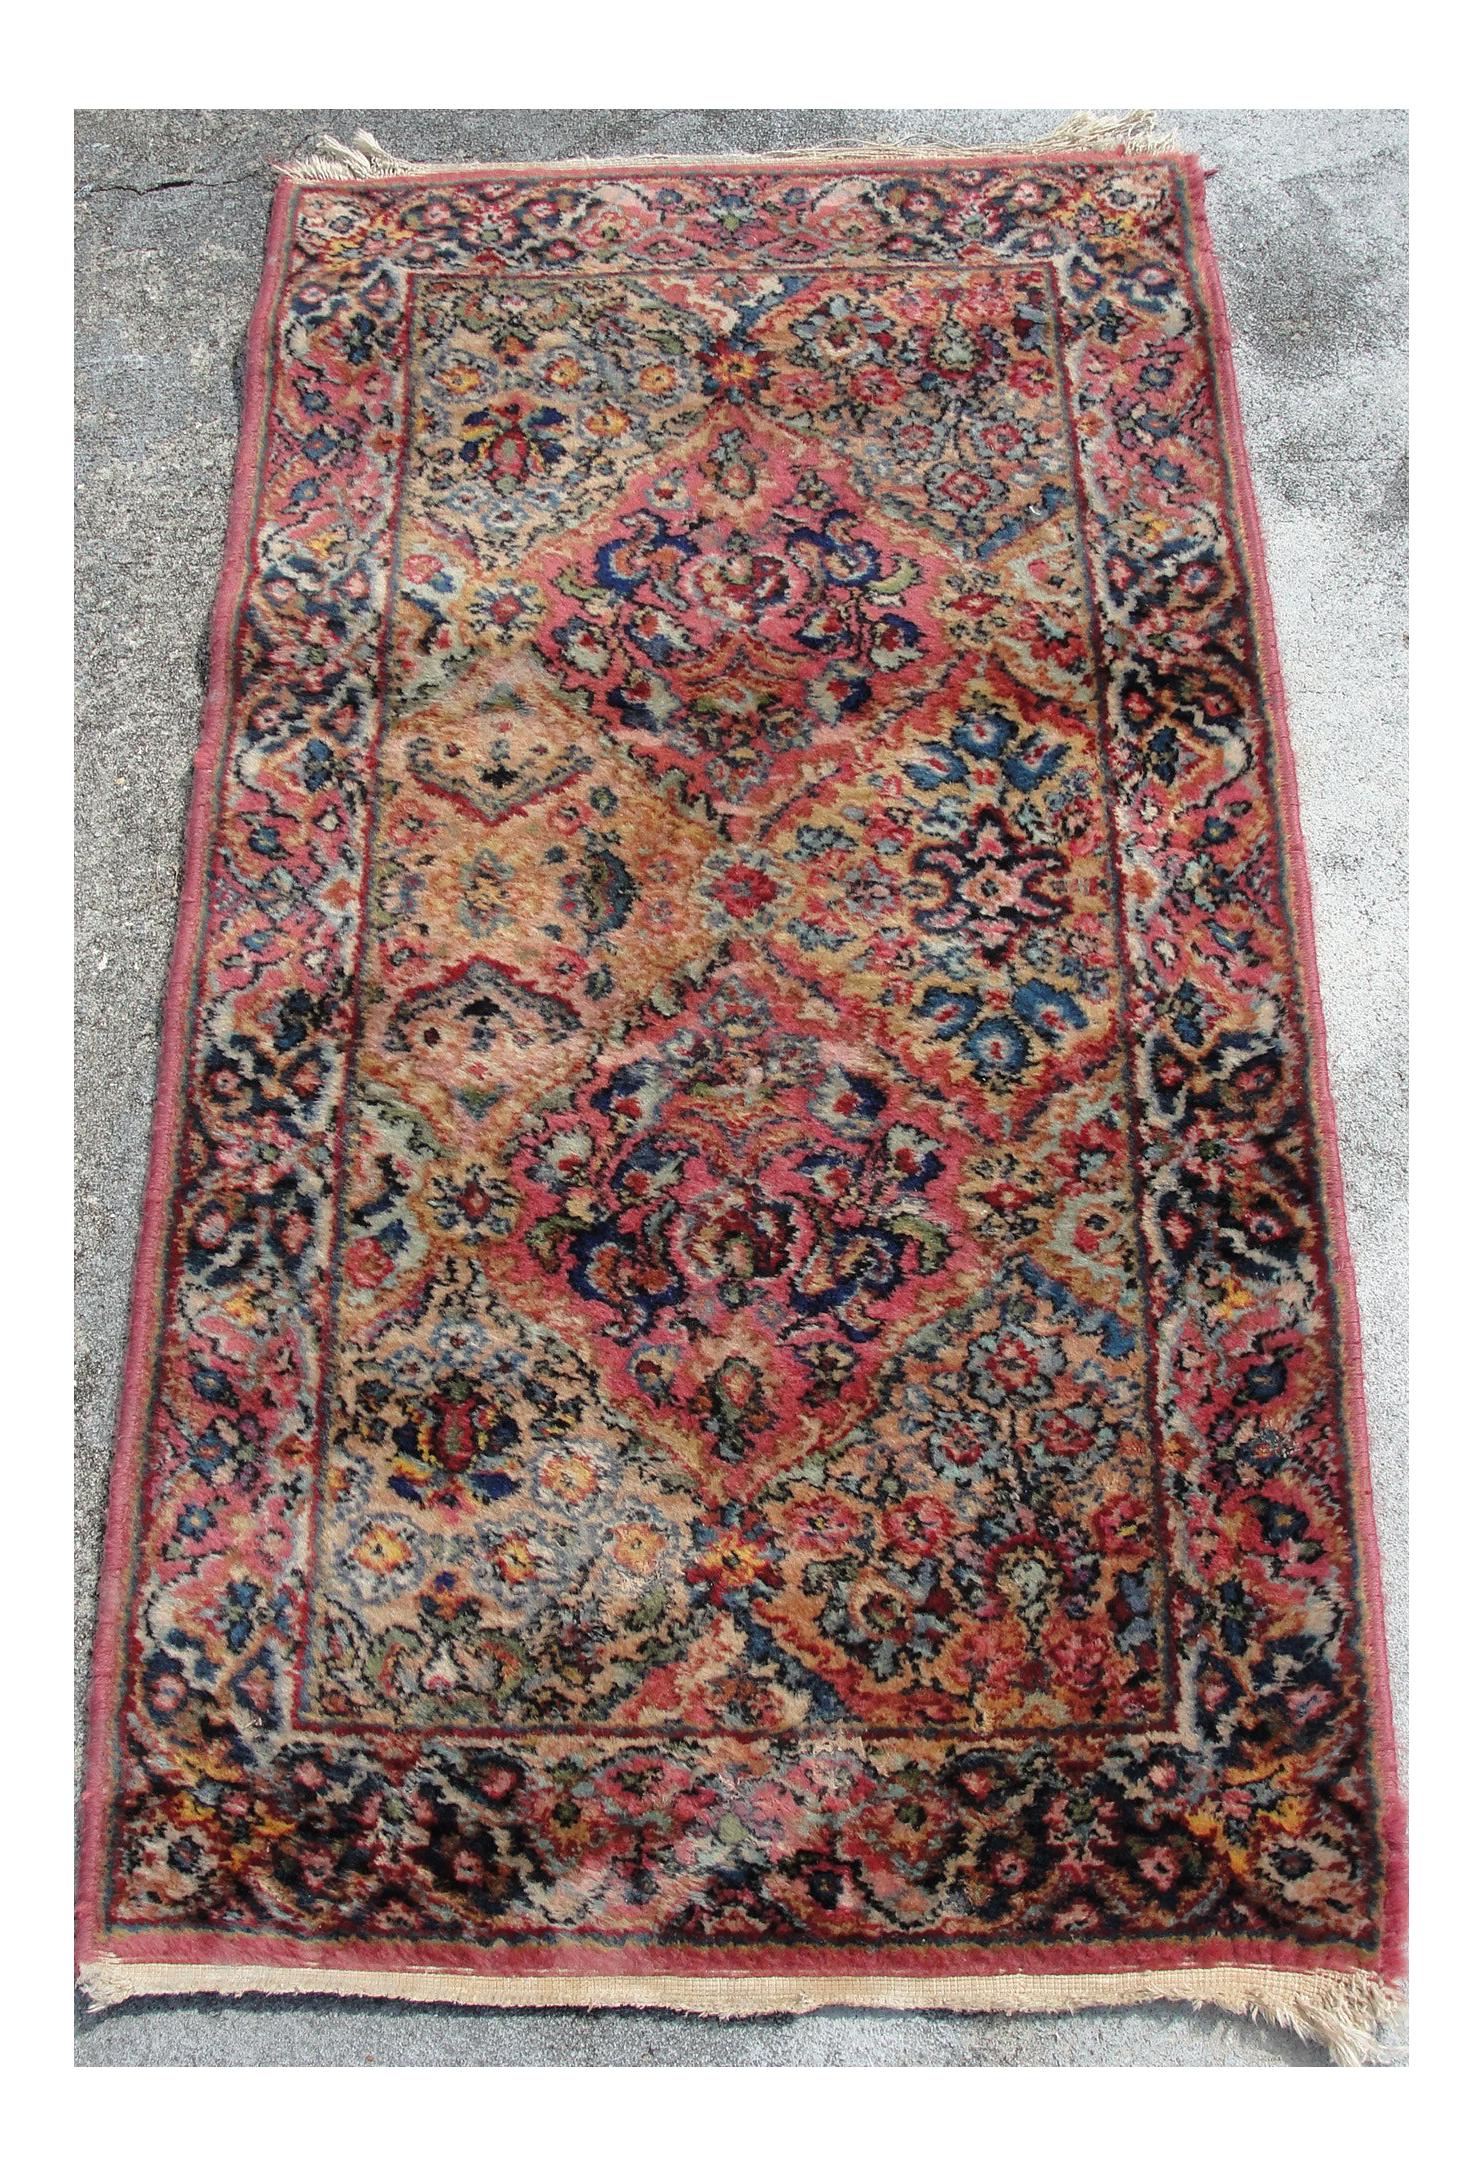 Vintage Used Karastan Rugs For Sale Chairish